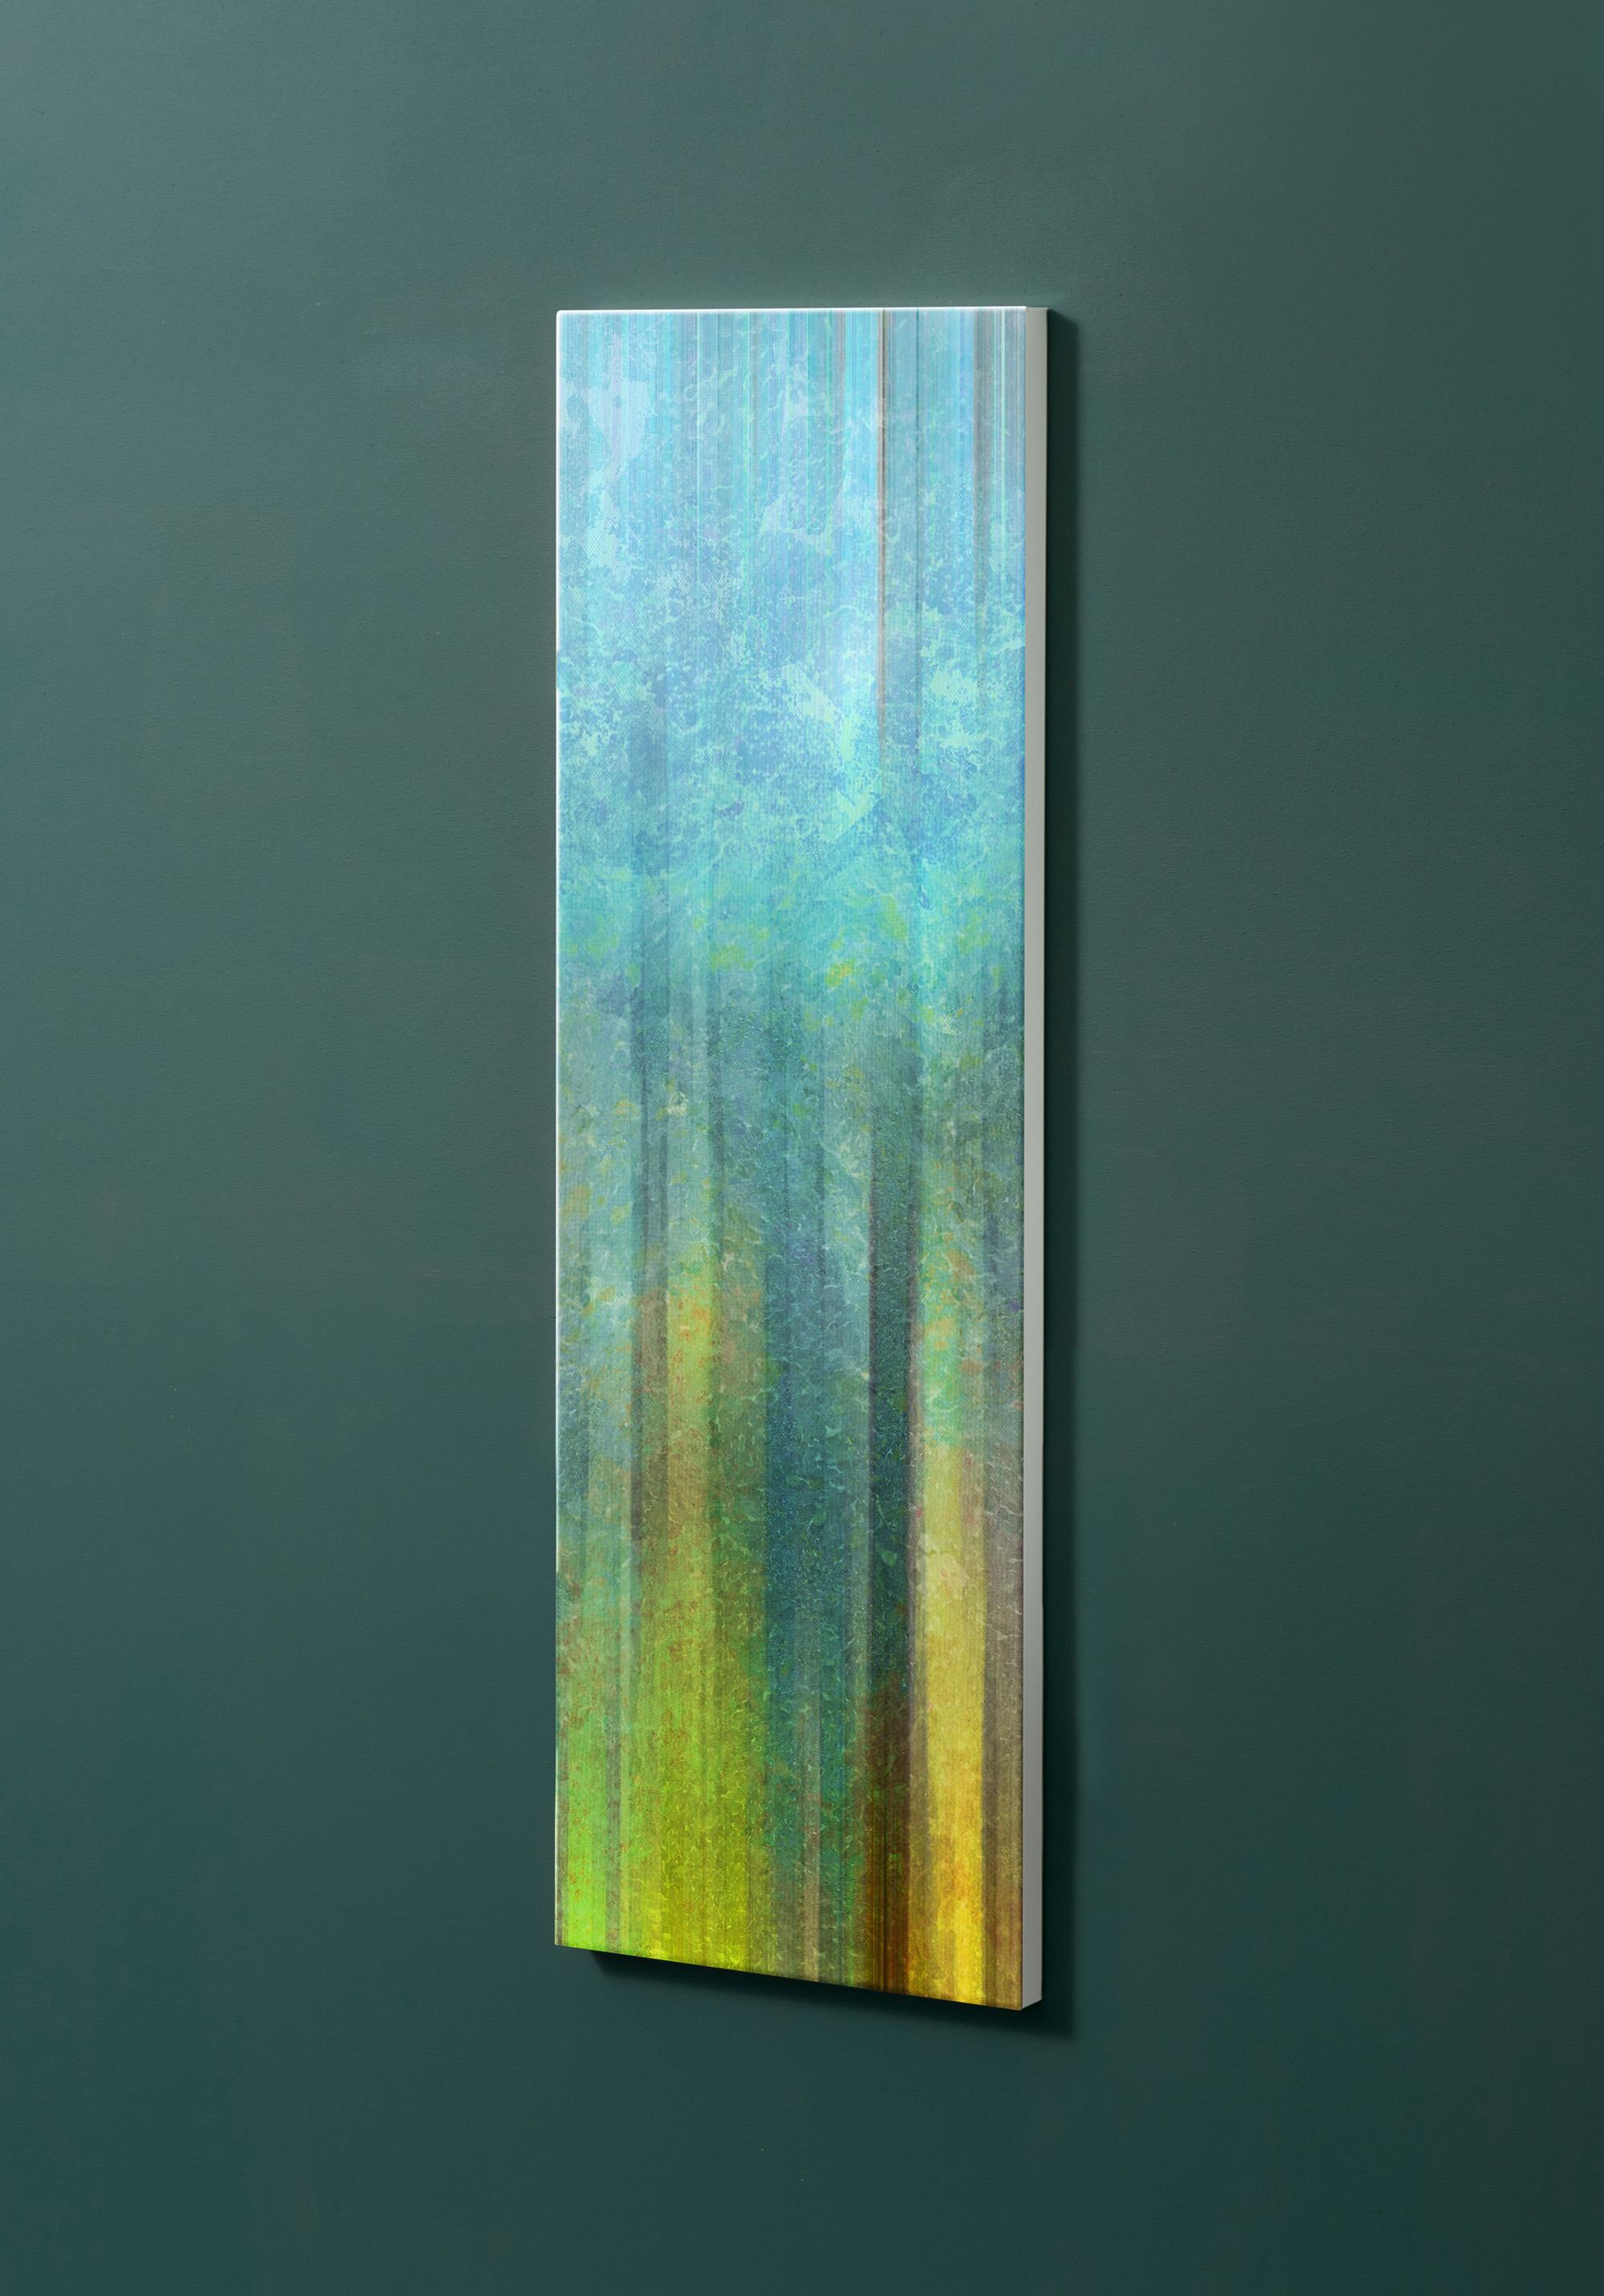 Magnettafel NOTIZ 30x90cm Motiv-Pinnwand M107 Abstrakt Kunst